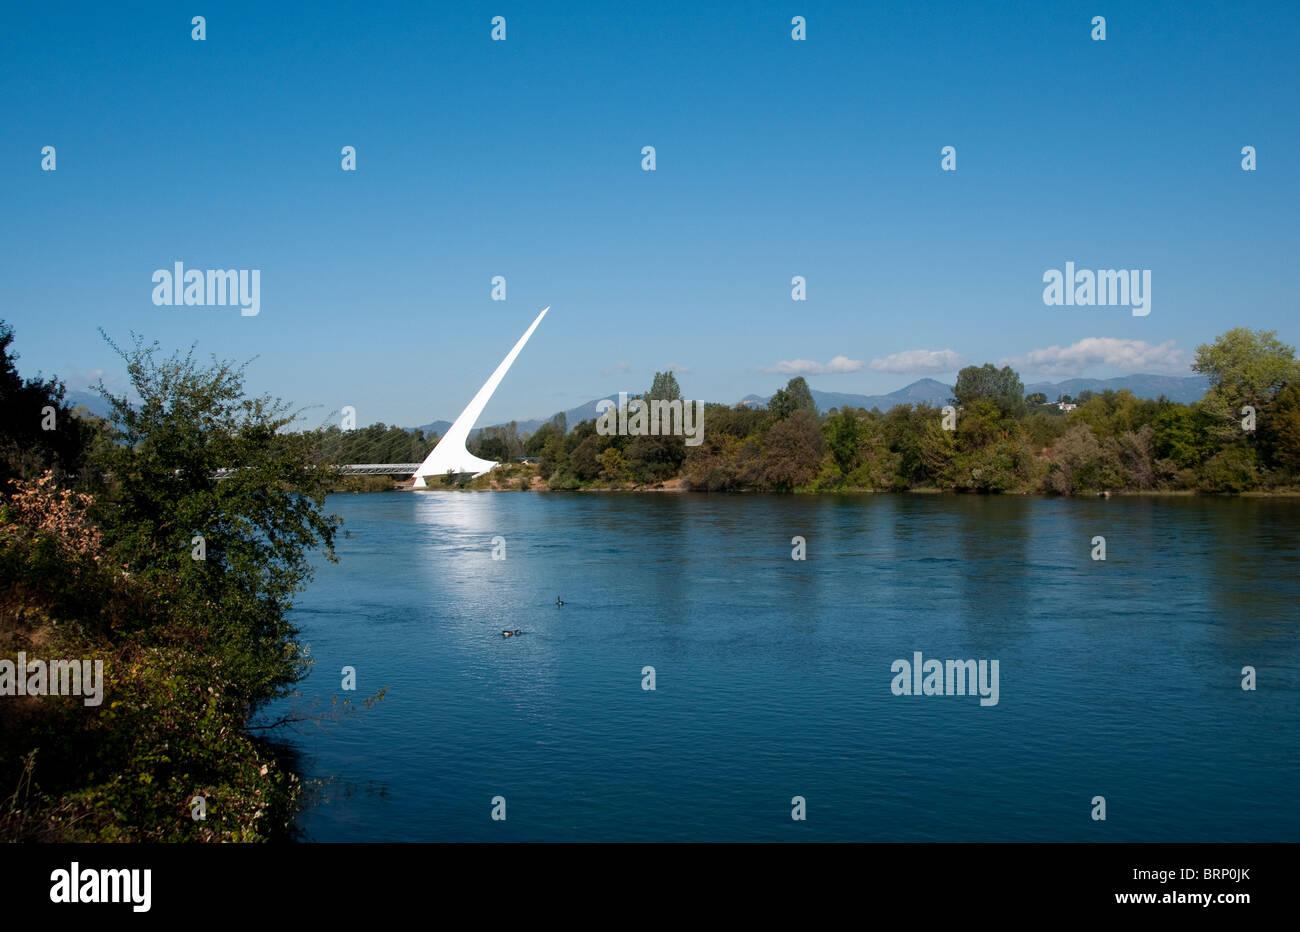 Sundial Bridge on Sacramento River in Redding California by architect Santiago Calatrava - Stock Image